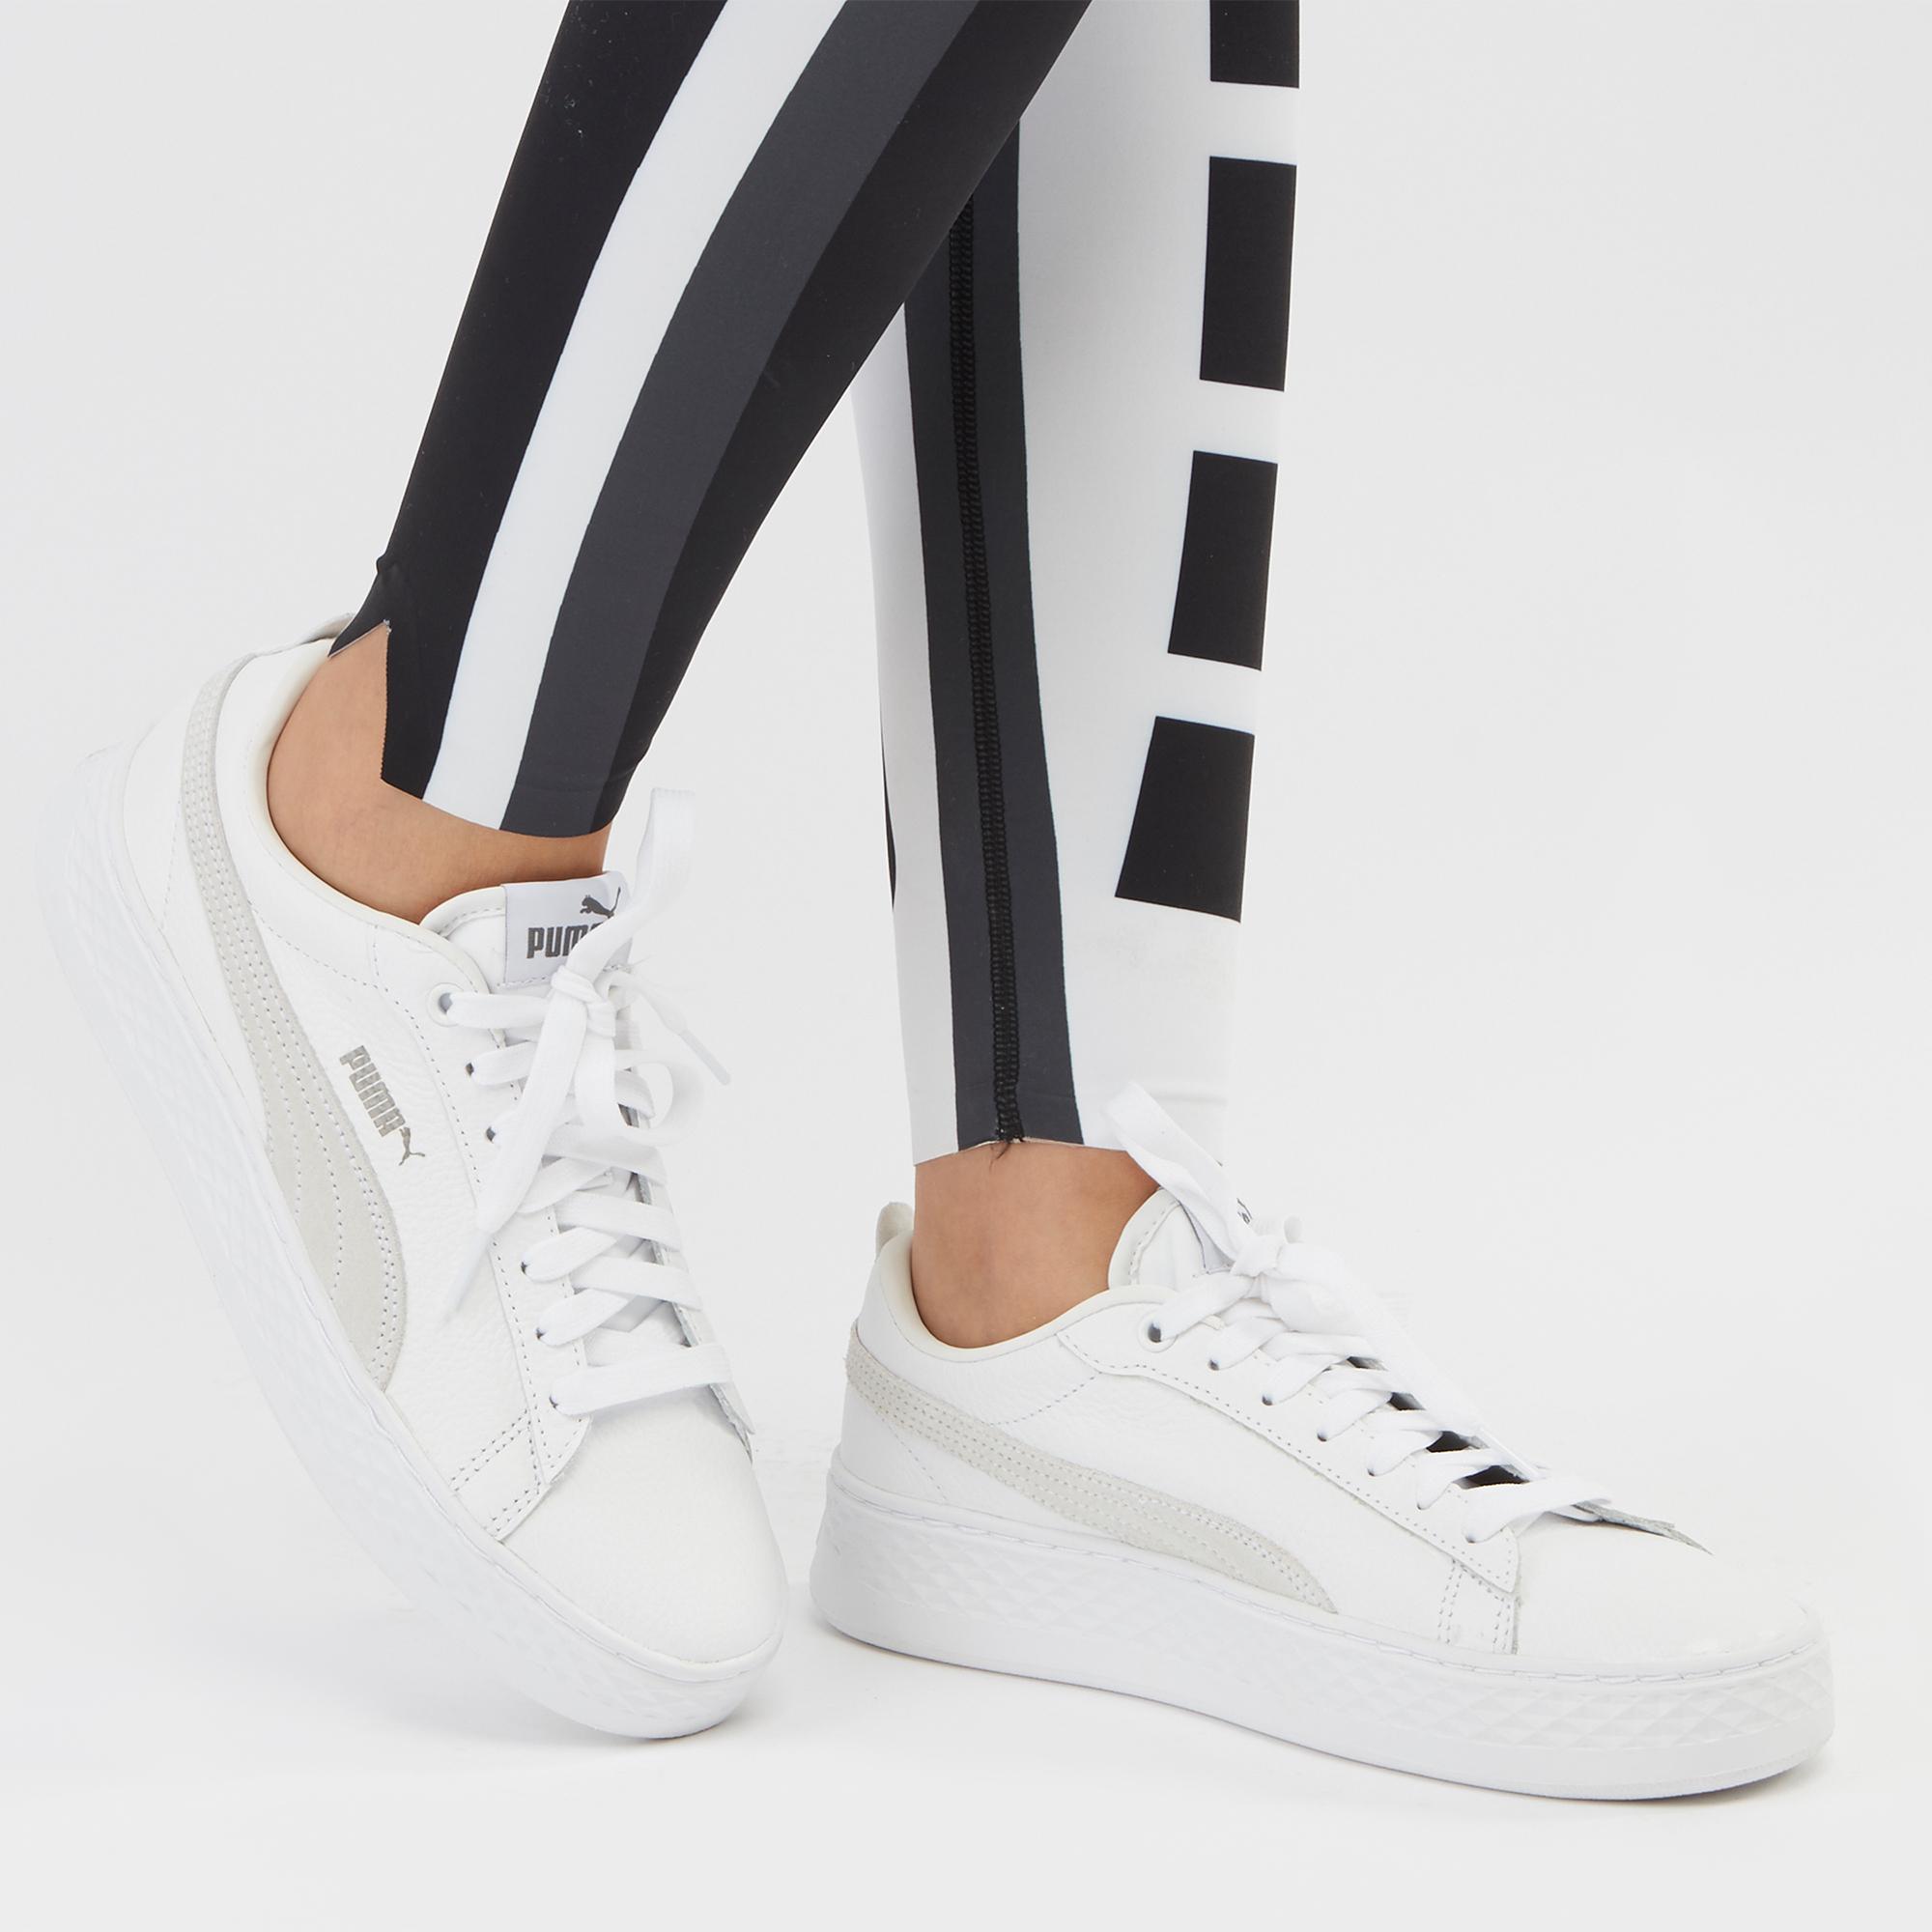 PUMA Smash Platform Shoe   Sneakers   Shoes   Sports Fashion ...